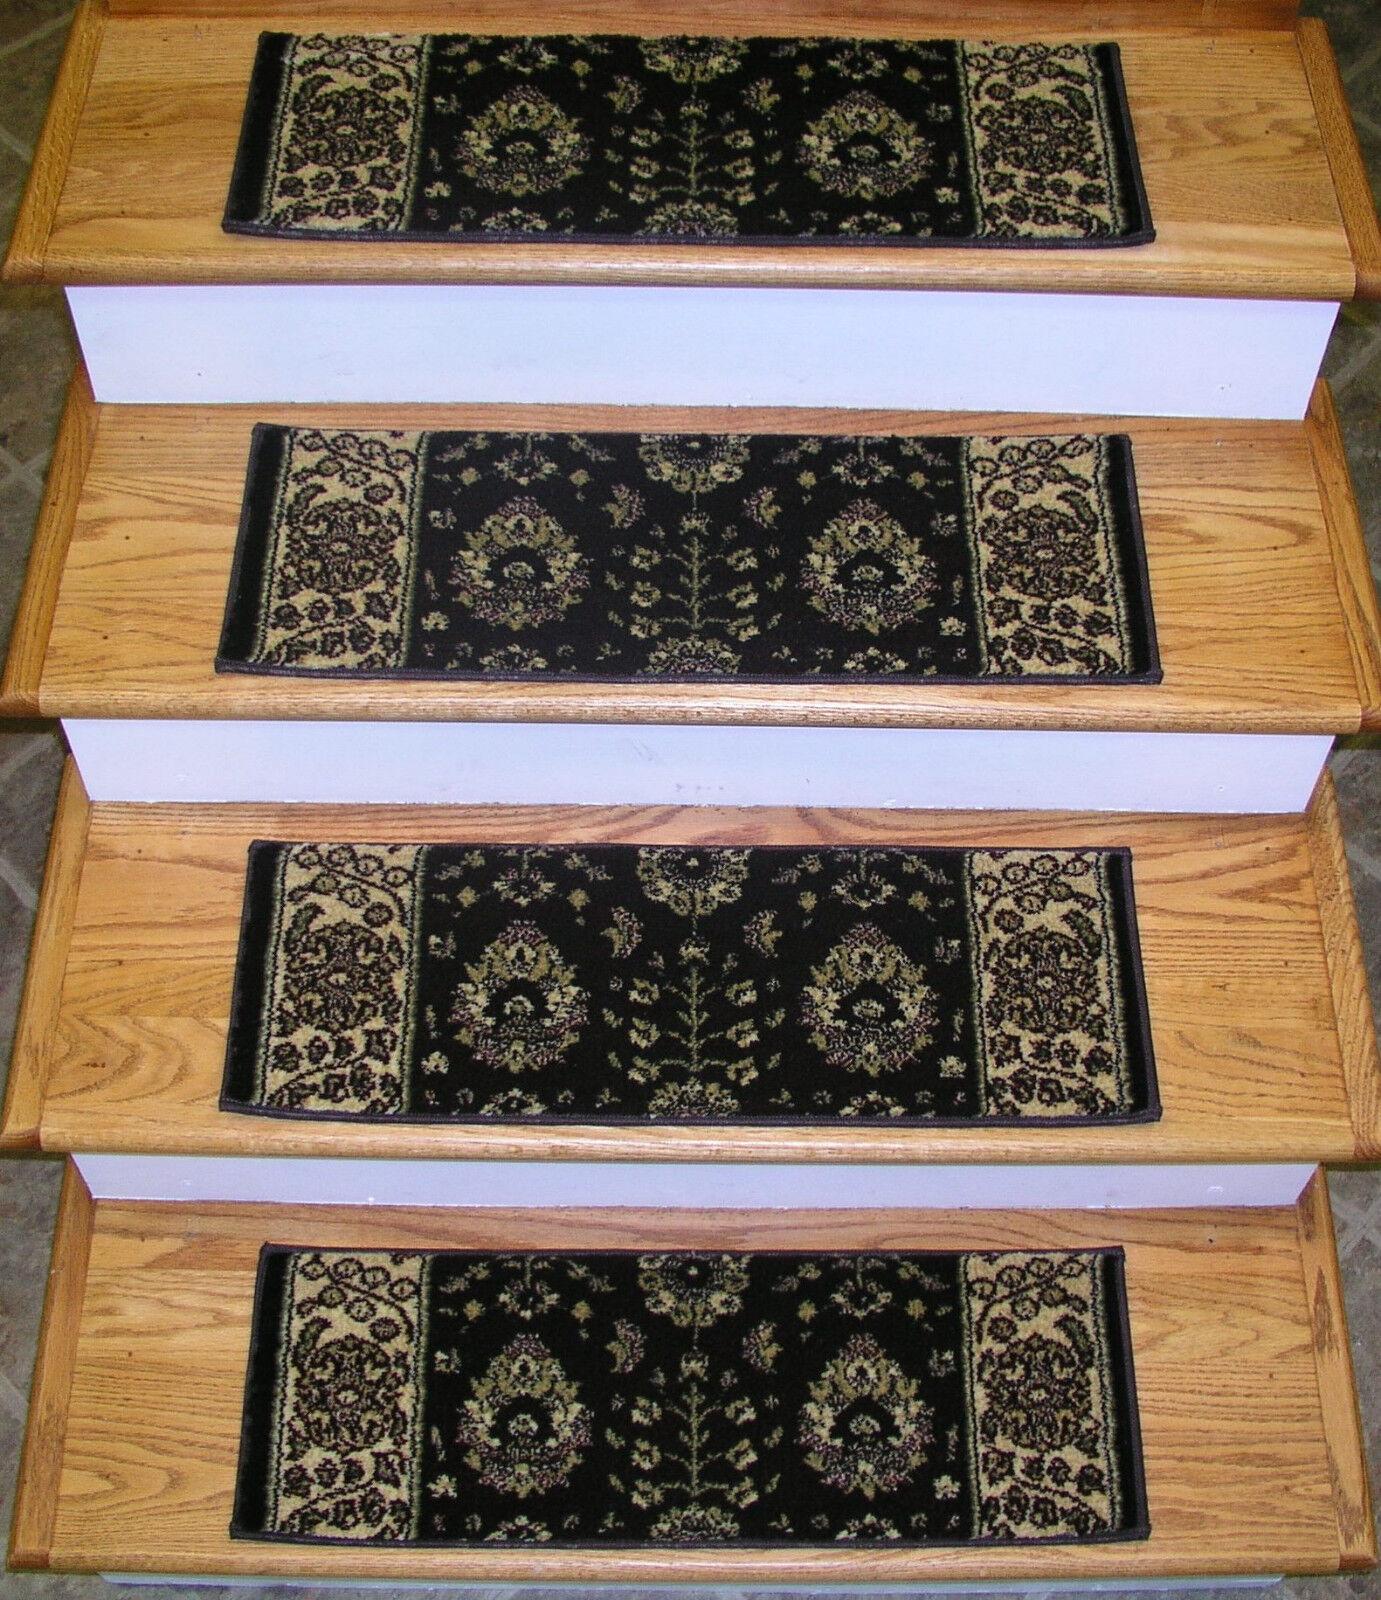 Rug Depot Set of 13 Traditional Non Slip Carpet Stair Treads 26  x 9  Marronee